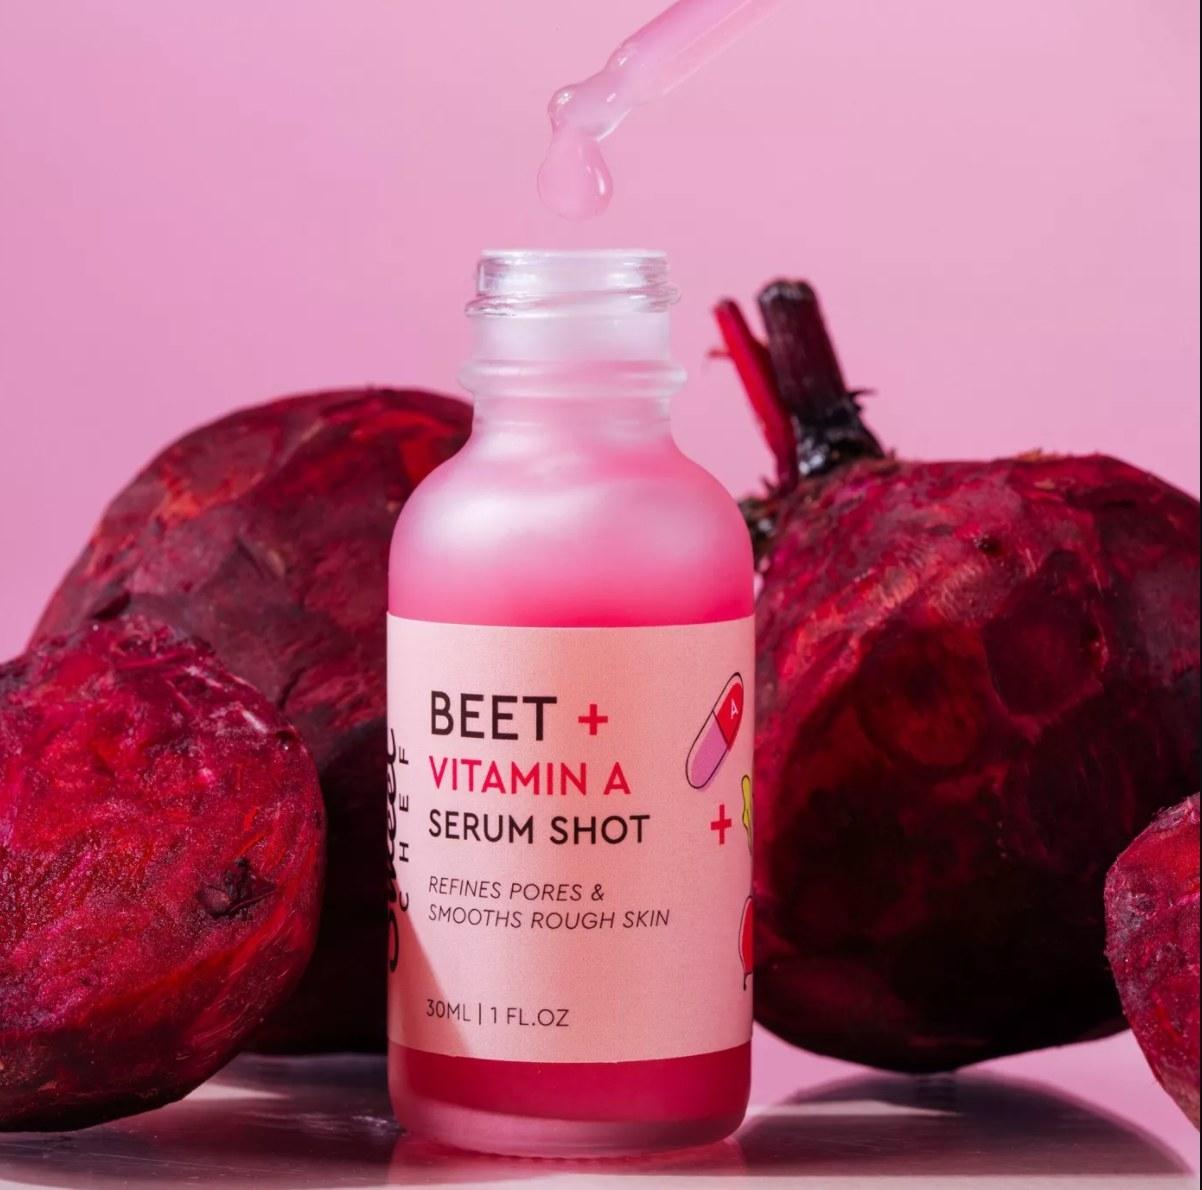 Sweet chef beet shot next to actual beets